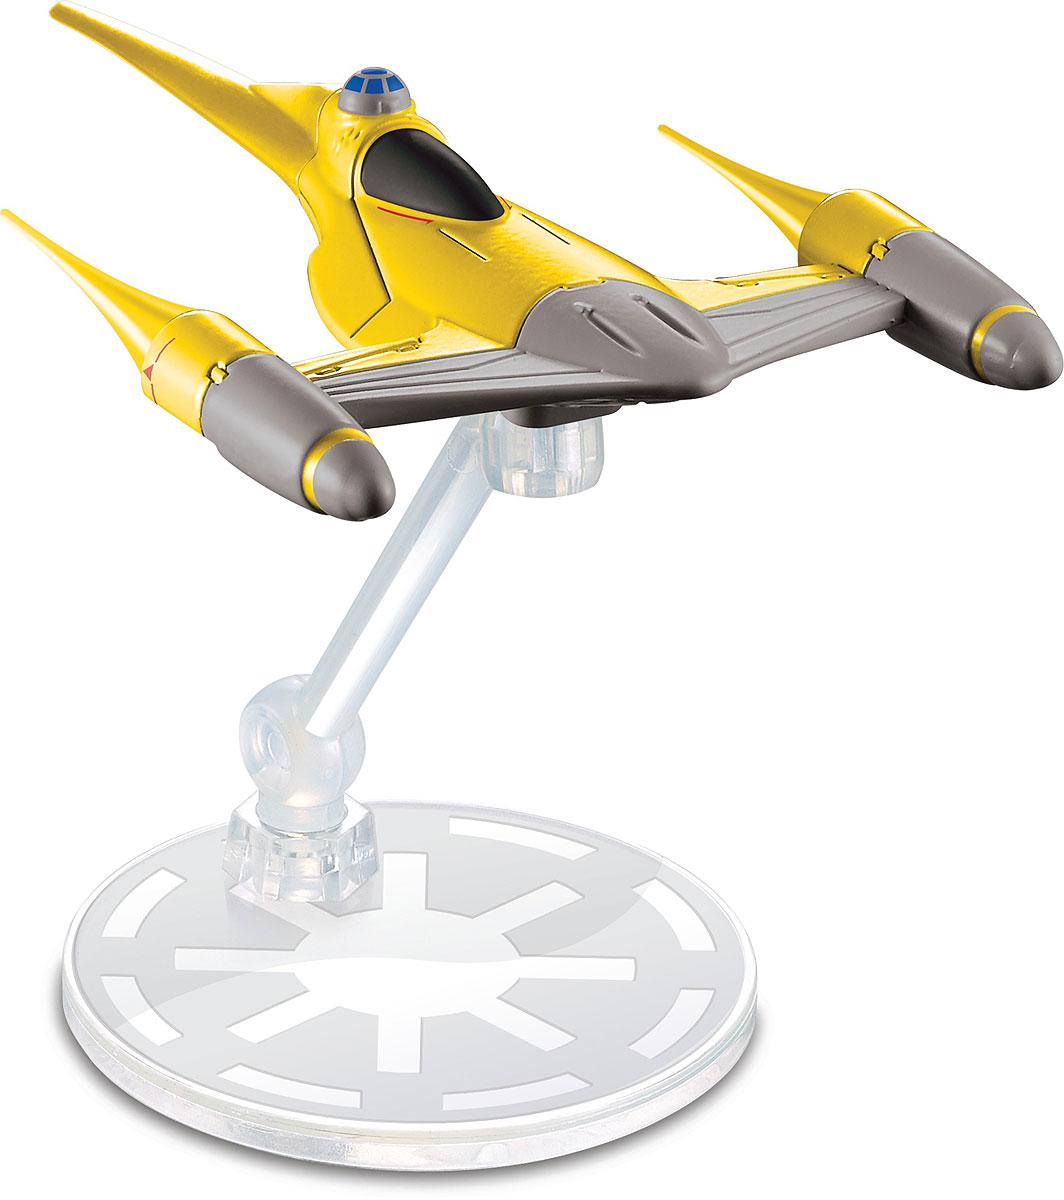 Hot Wheels Star Wars Космический корабль Naboo N-1 Starfighter - Транспорт, машинки